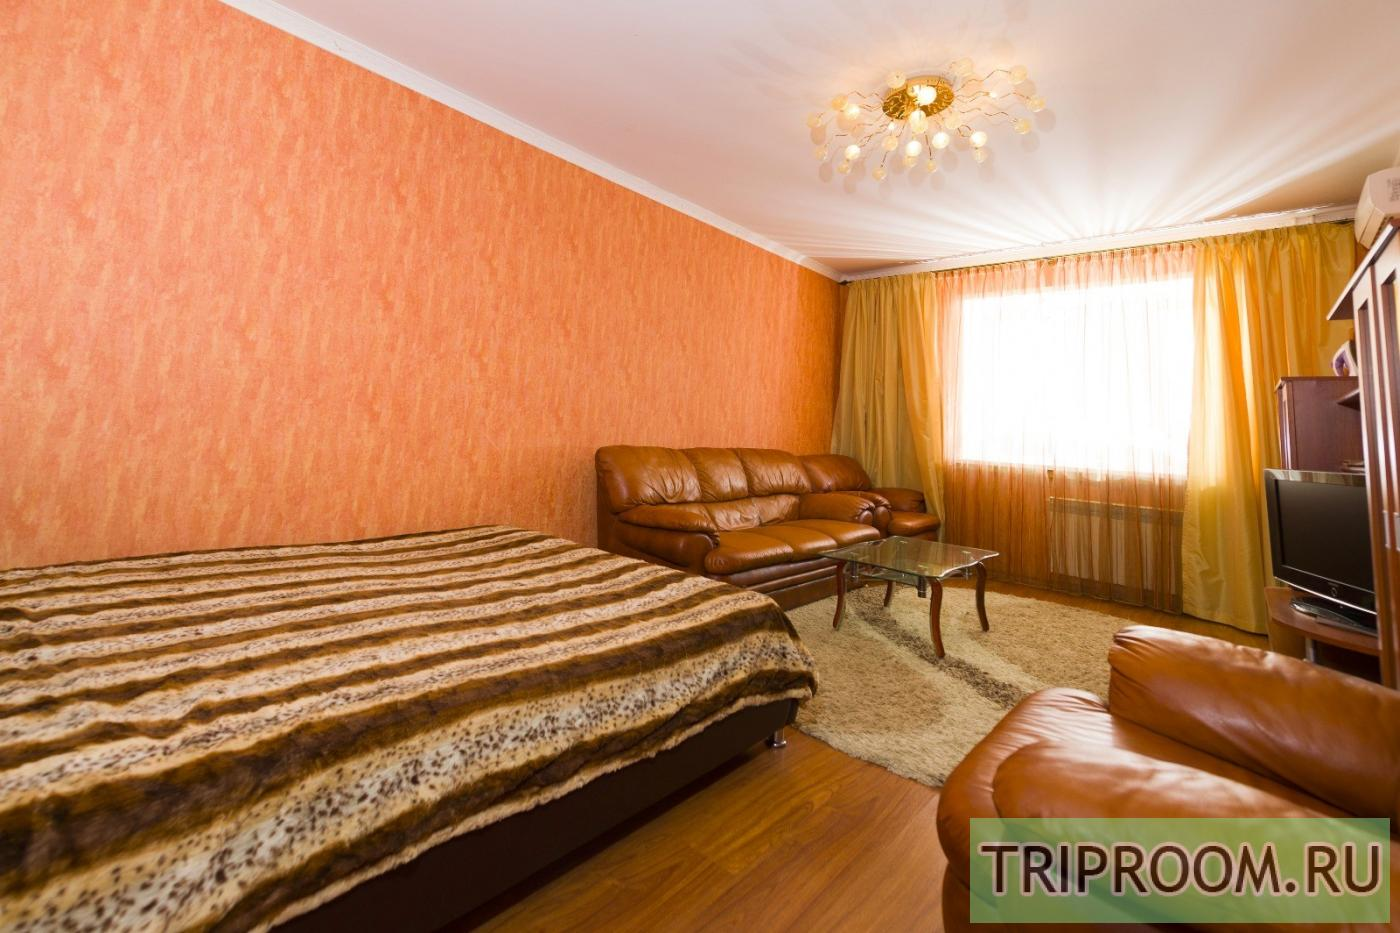 2-комнатная квартира посуточно (вариант № 2850), ул. Габдуллы Тукая улица, фото № 9